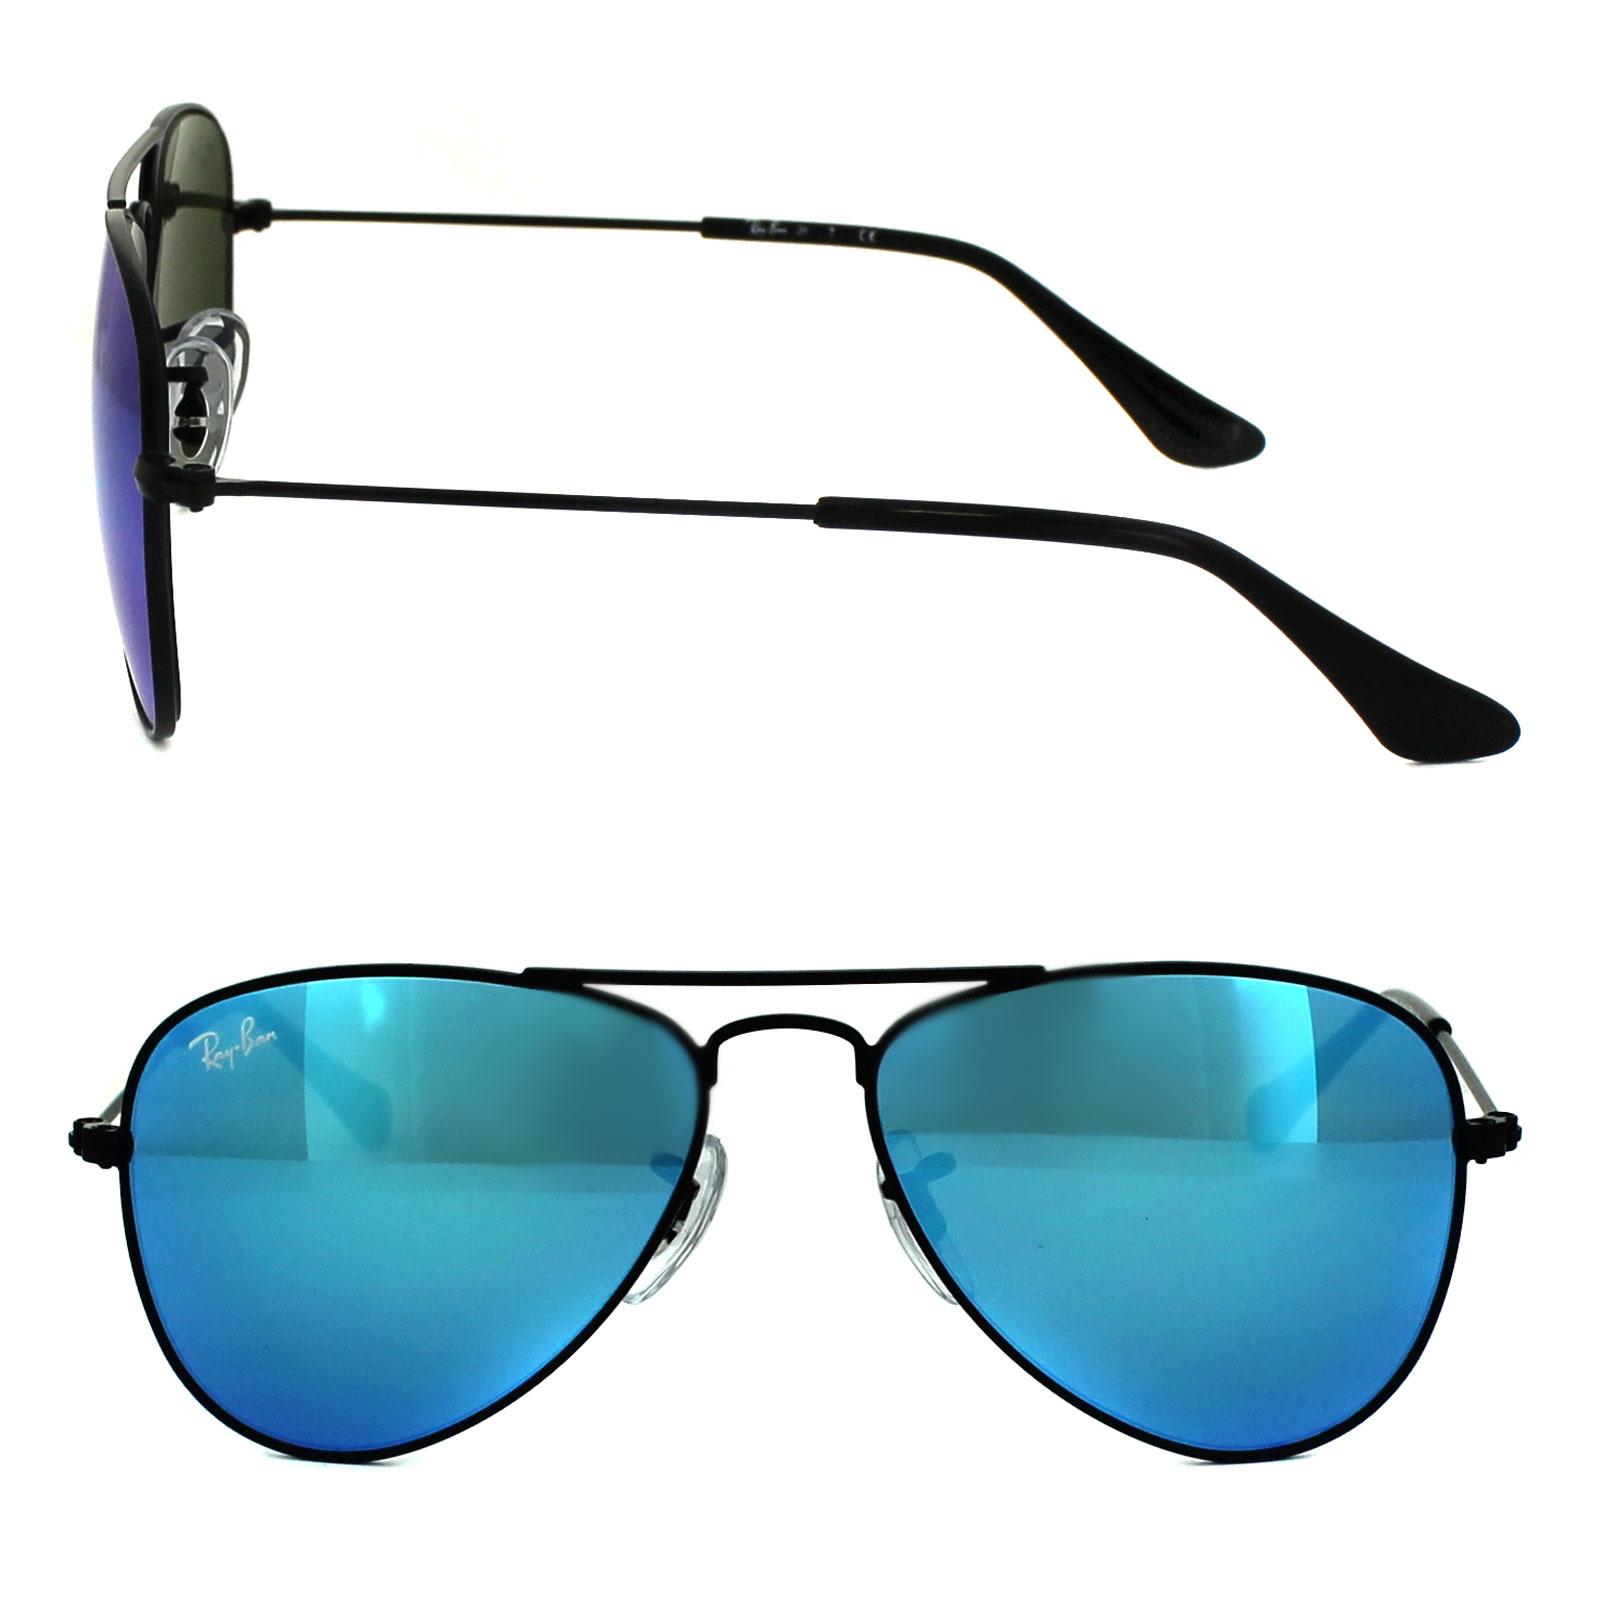 dd9e7c6ecf6b6 Sentinel Ray-Ban Junior Sunglasses 9506 201 55 Black Blue Flash Mirror